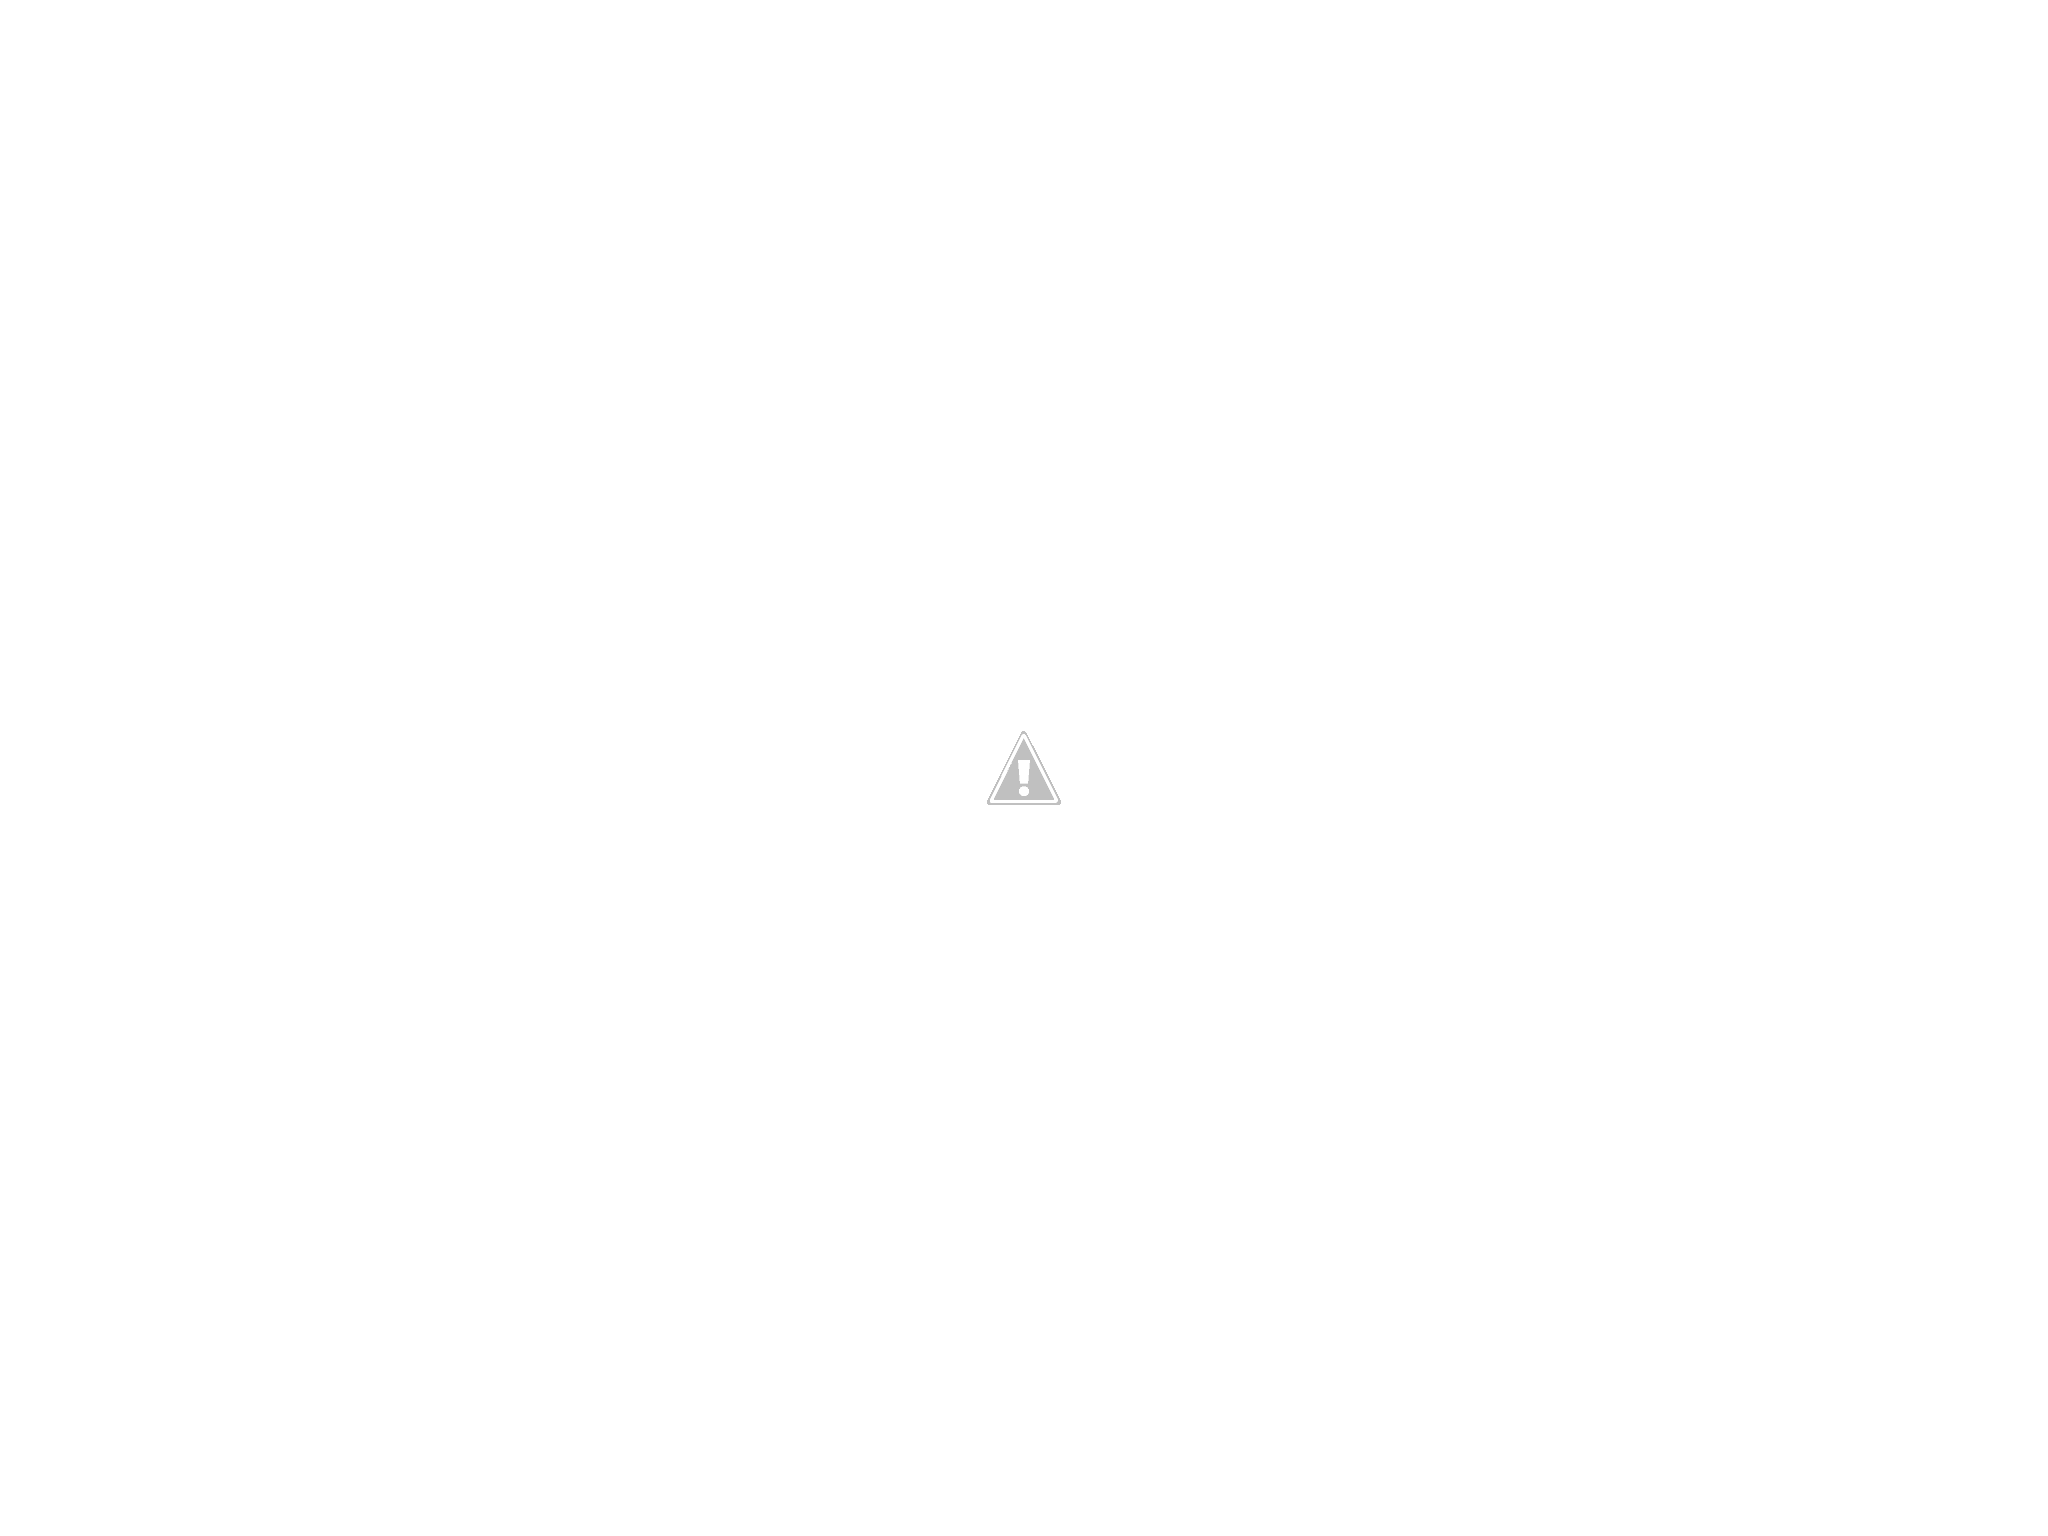 mark levinson no 332 dual monaural stereo amplifier rh plus google com Mark Levinson No. 332 Mark Levinson 383